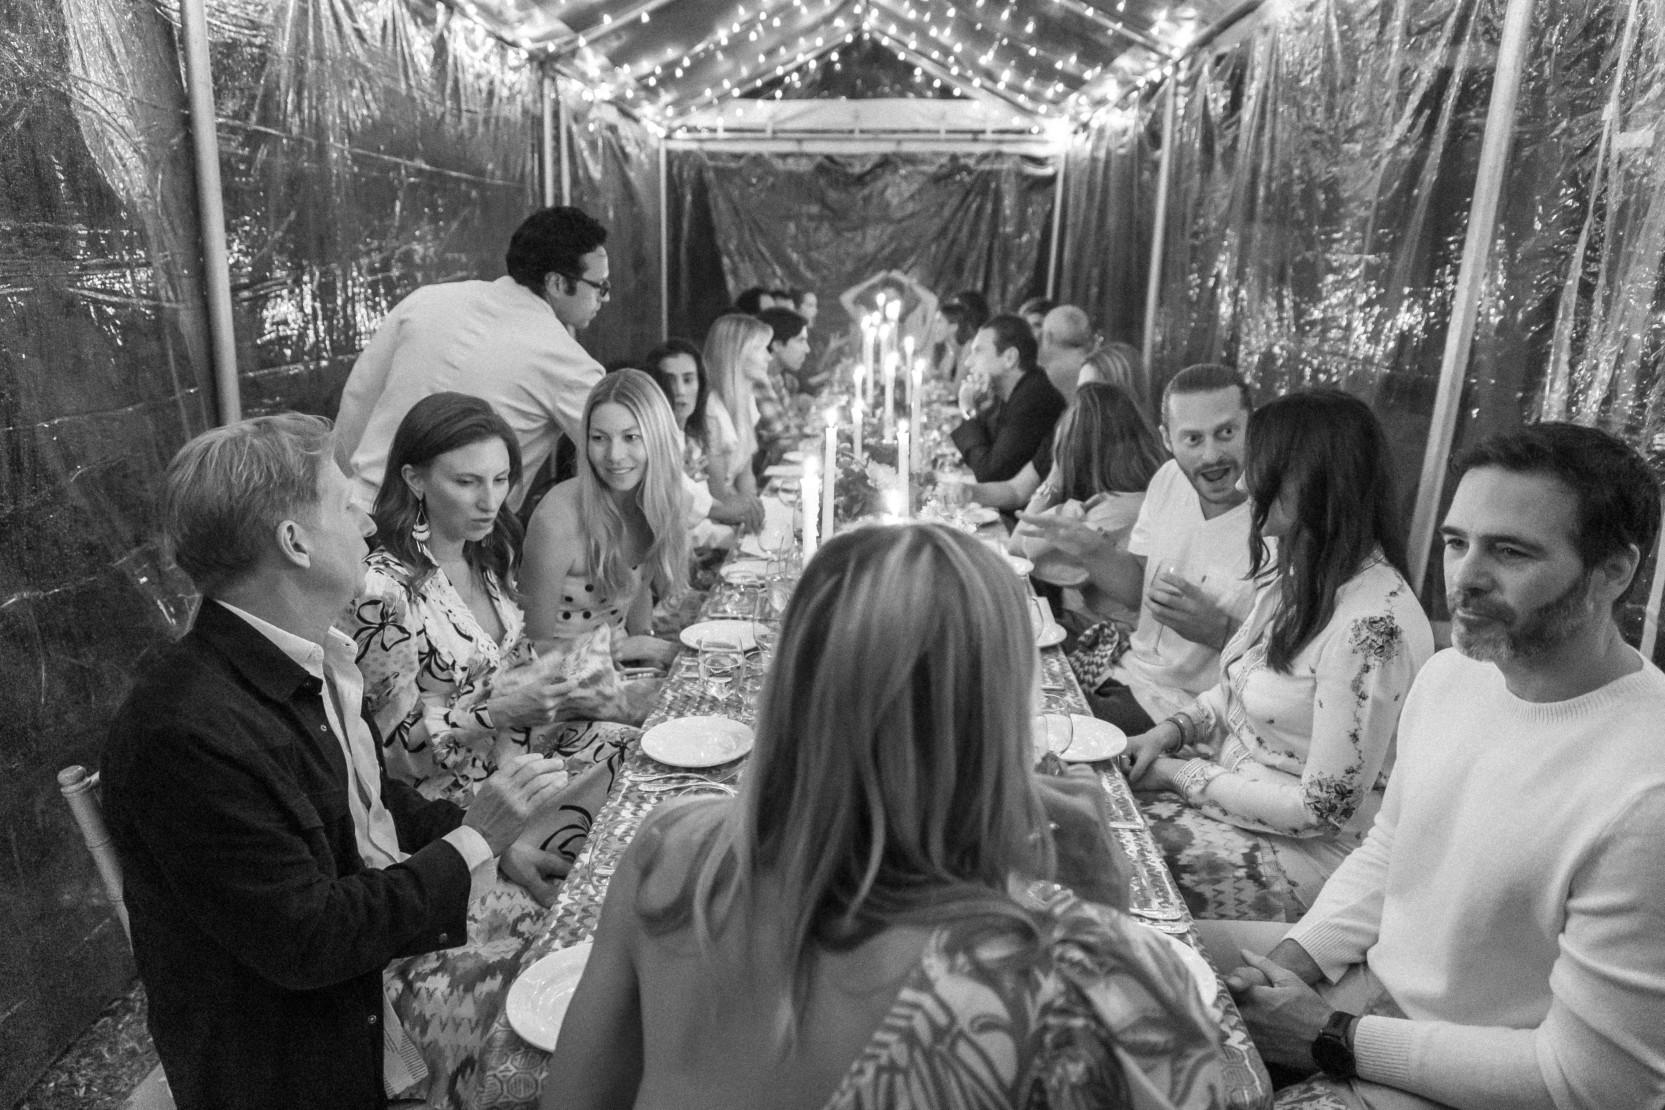 Dinner guests enjoy conversation in Aspen.